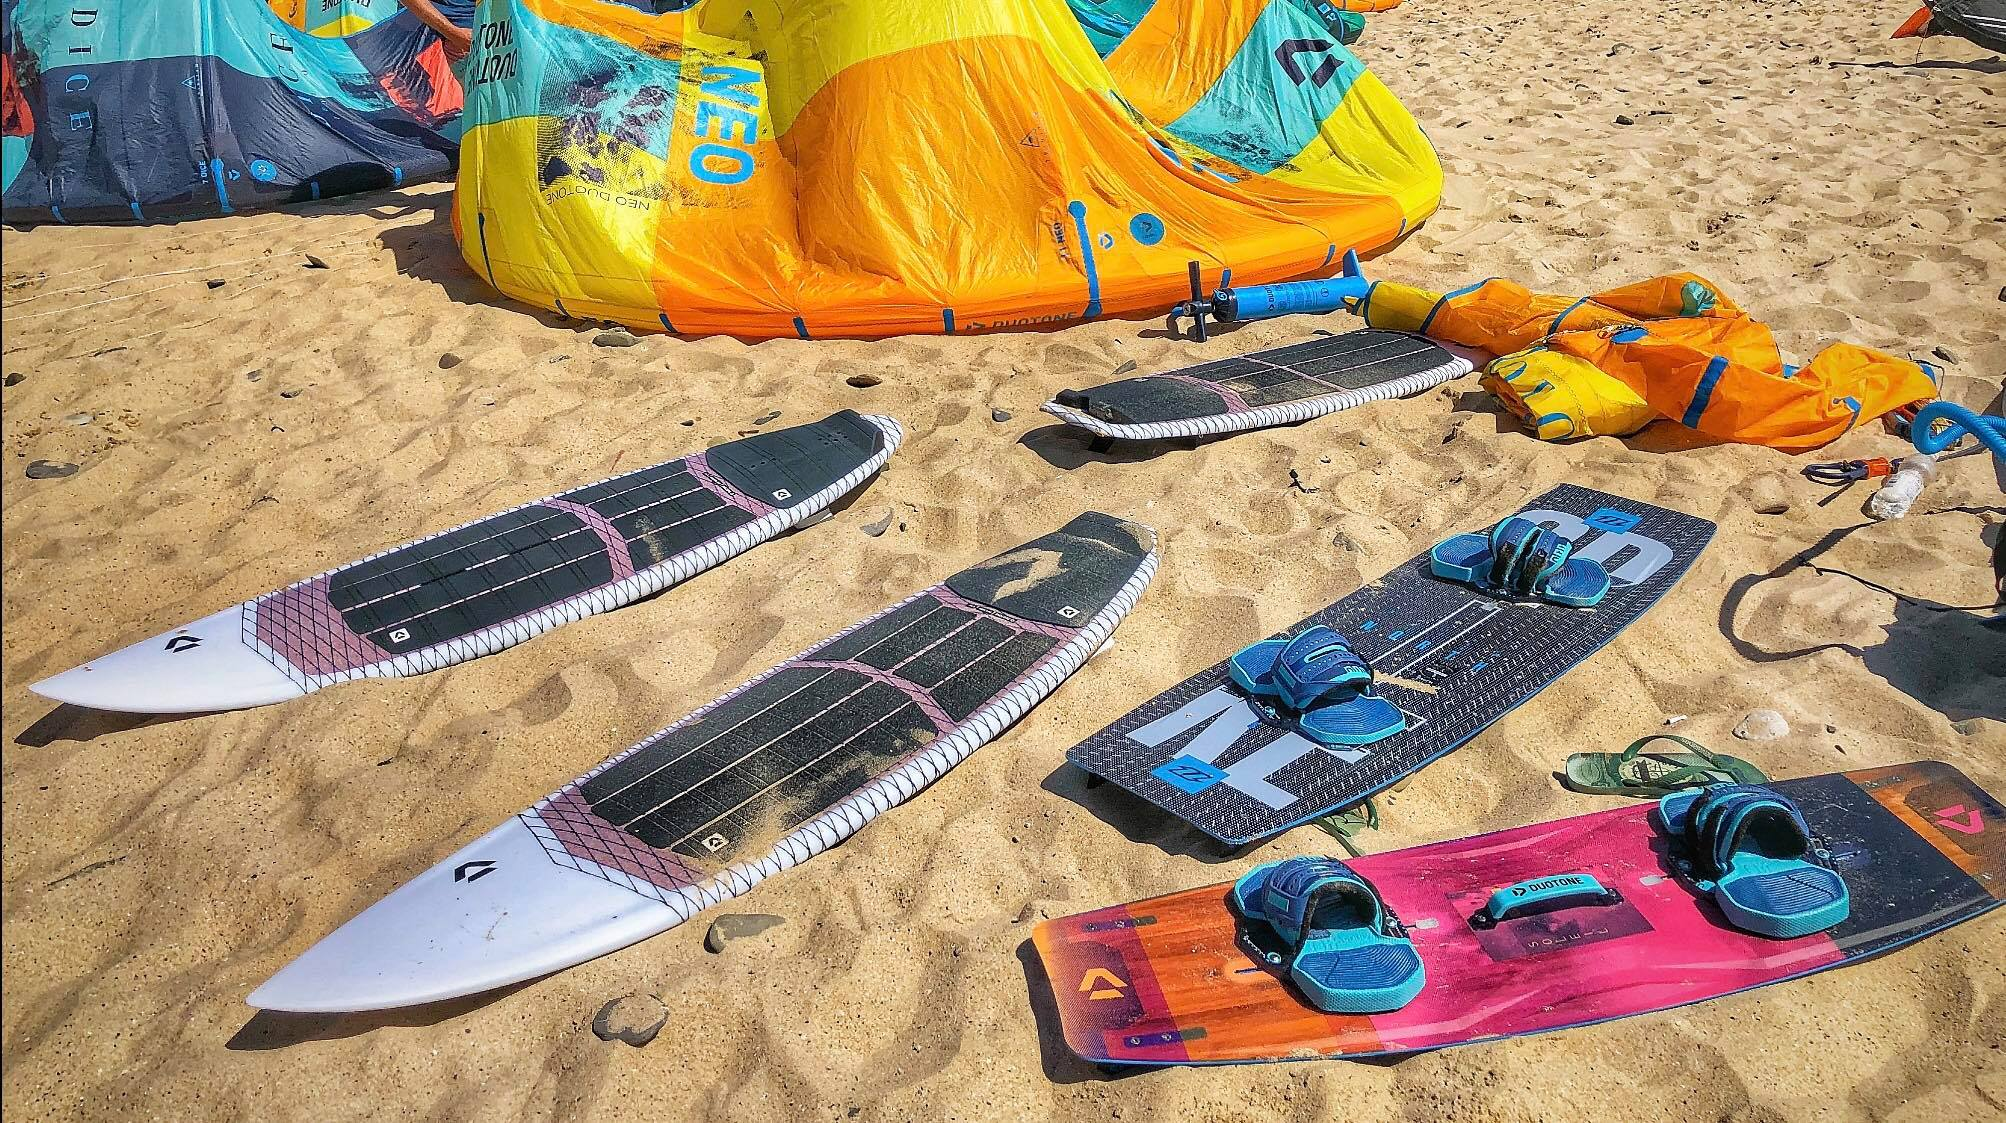 Duotone kiteboarding sport